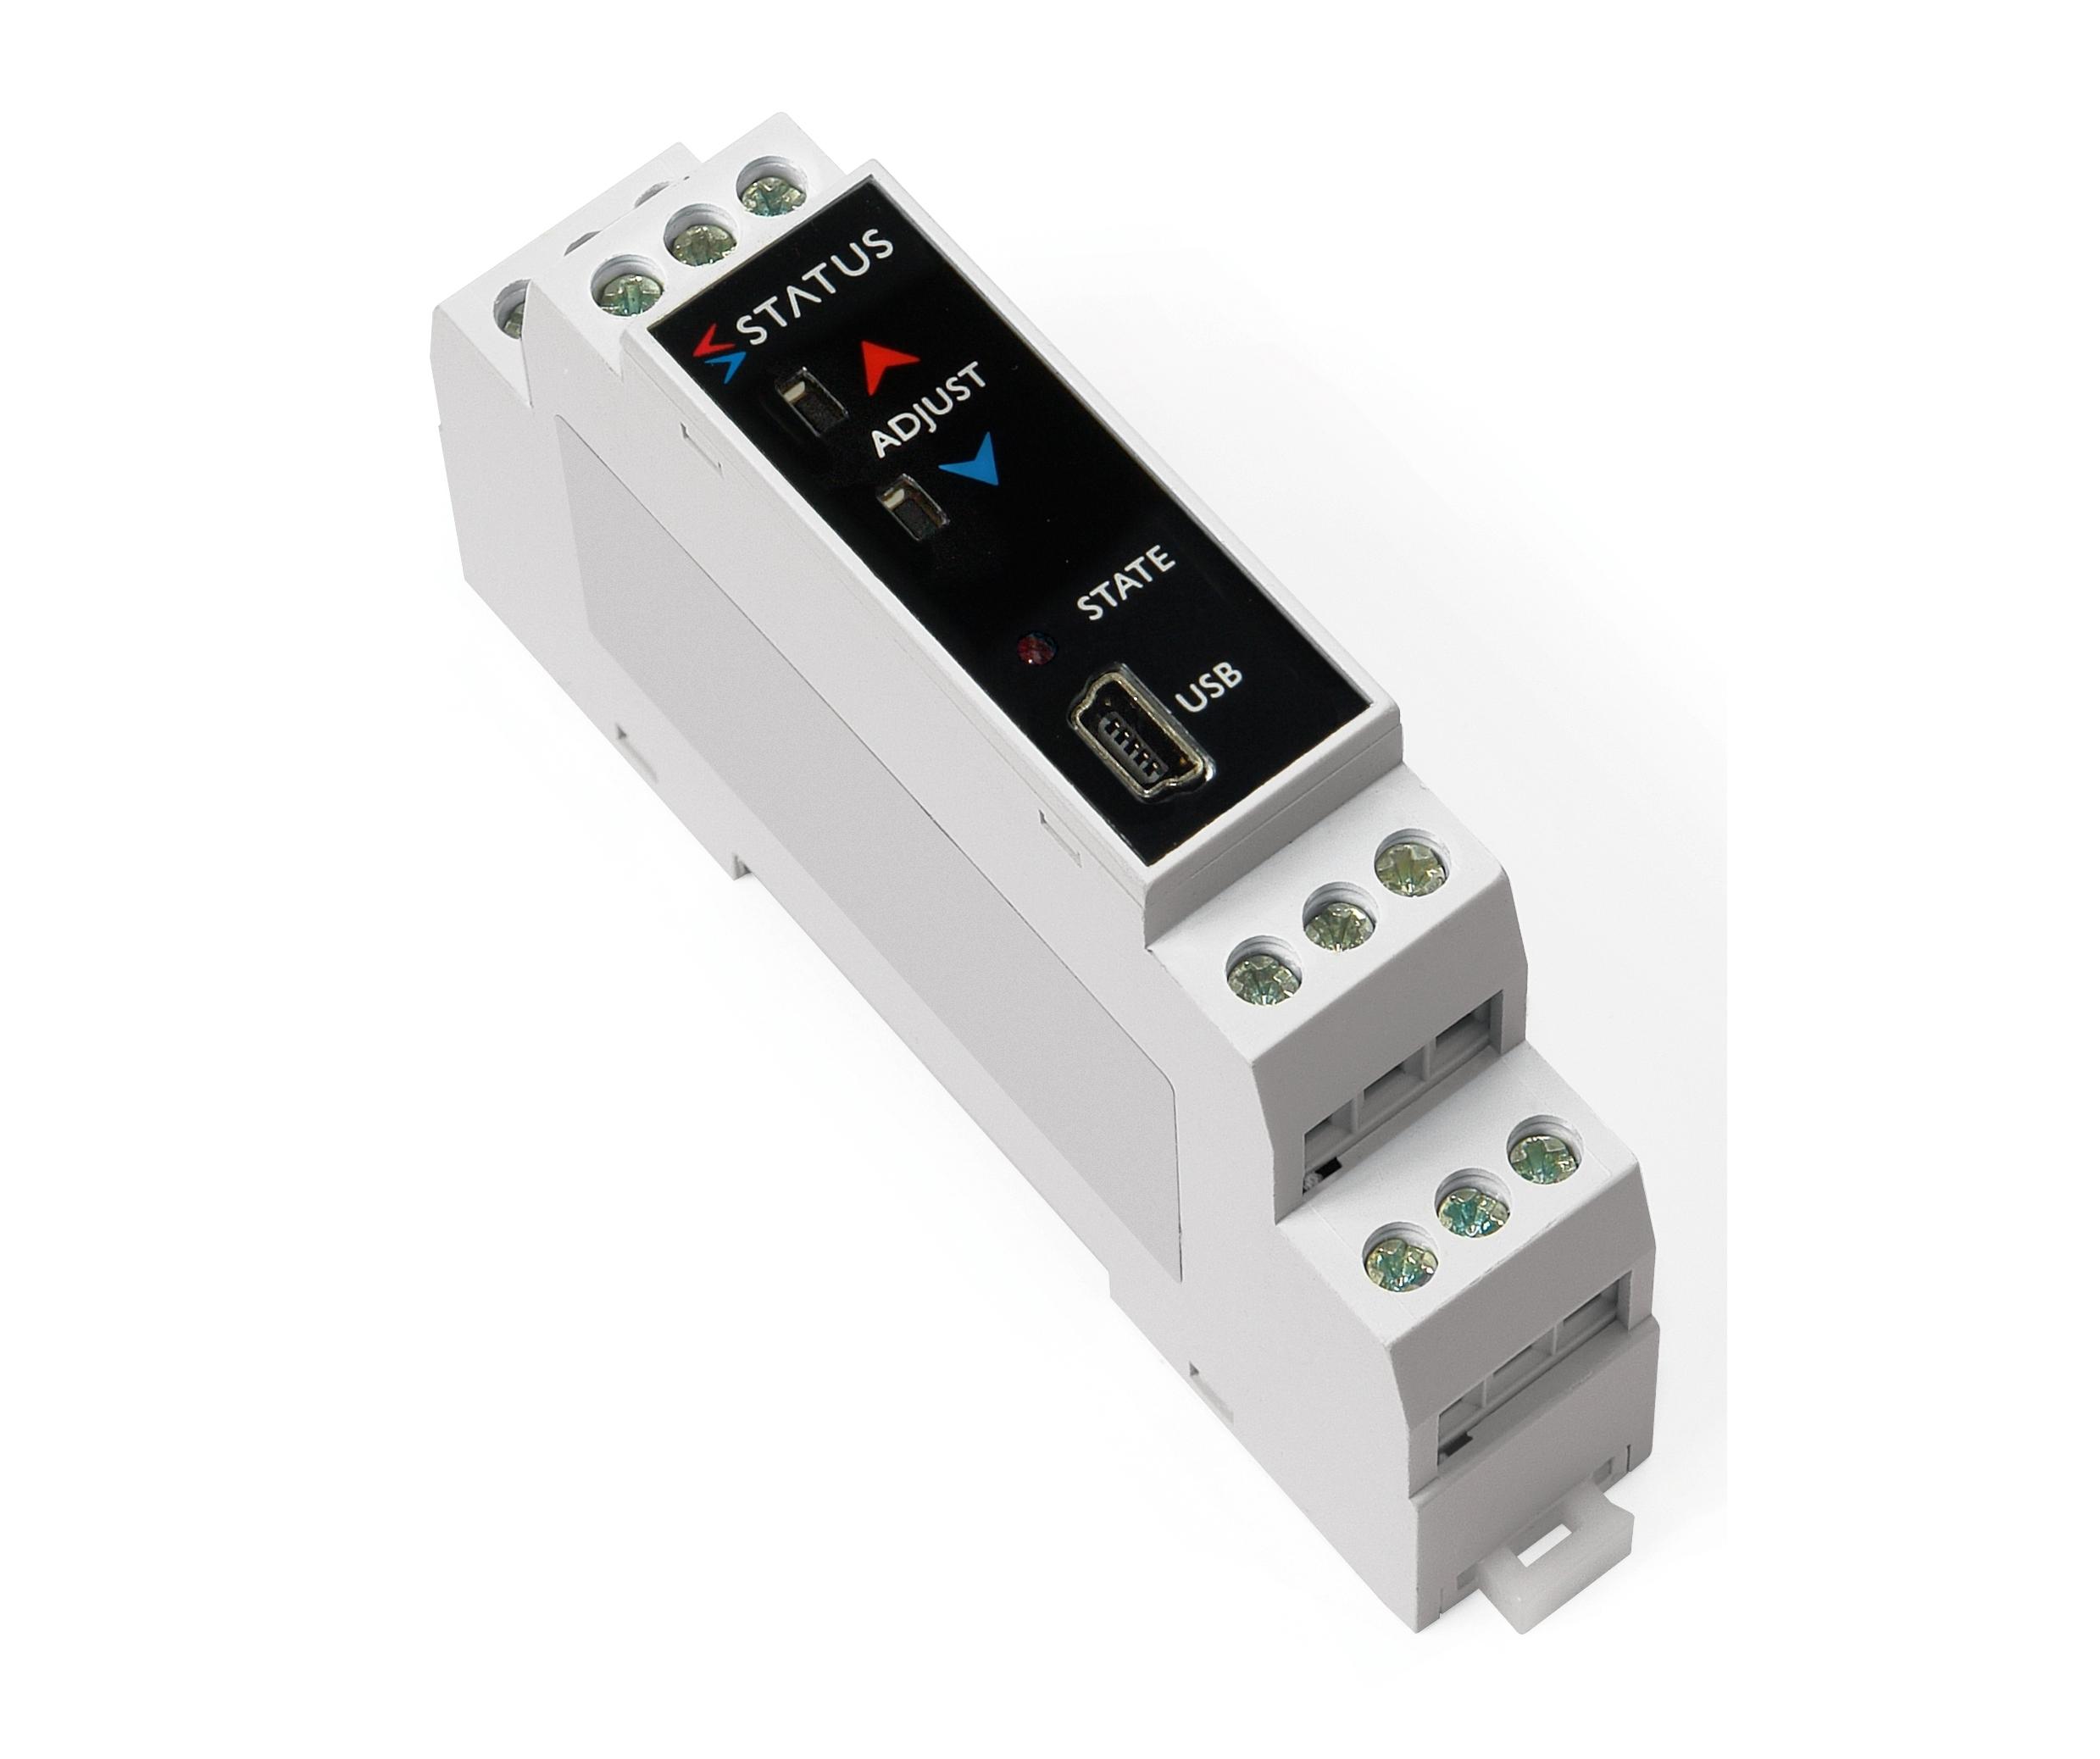 SEM1610 Programmable Pt100, Thermocouple, mV et mA Passive.